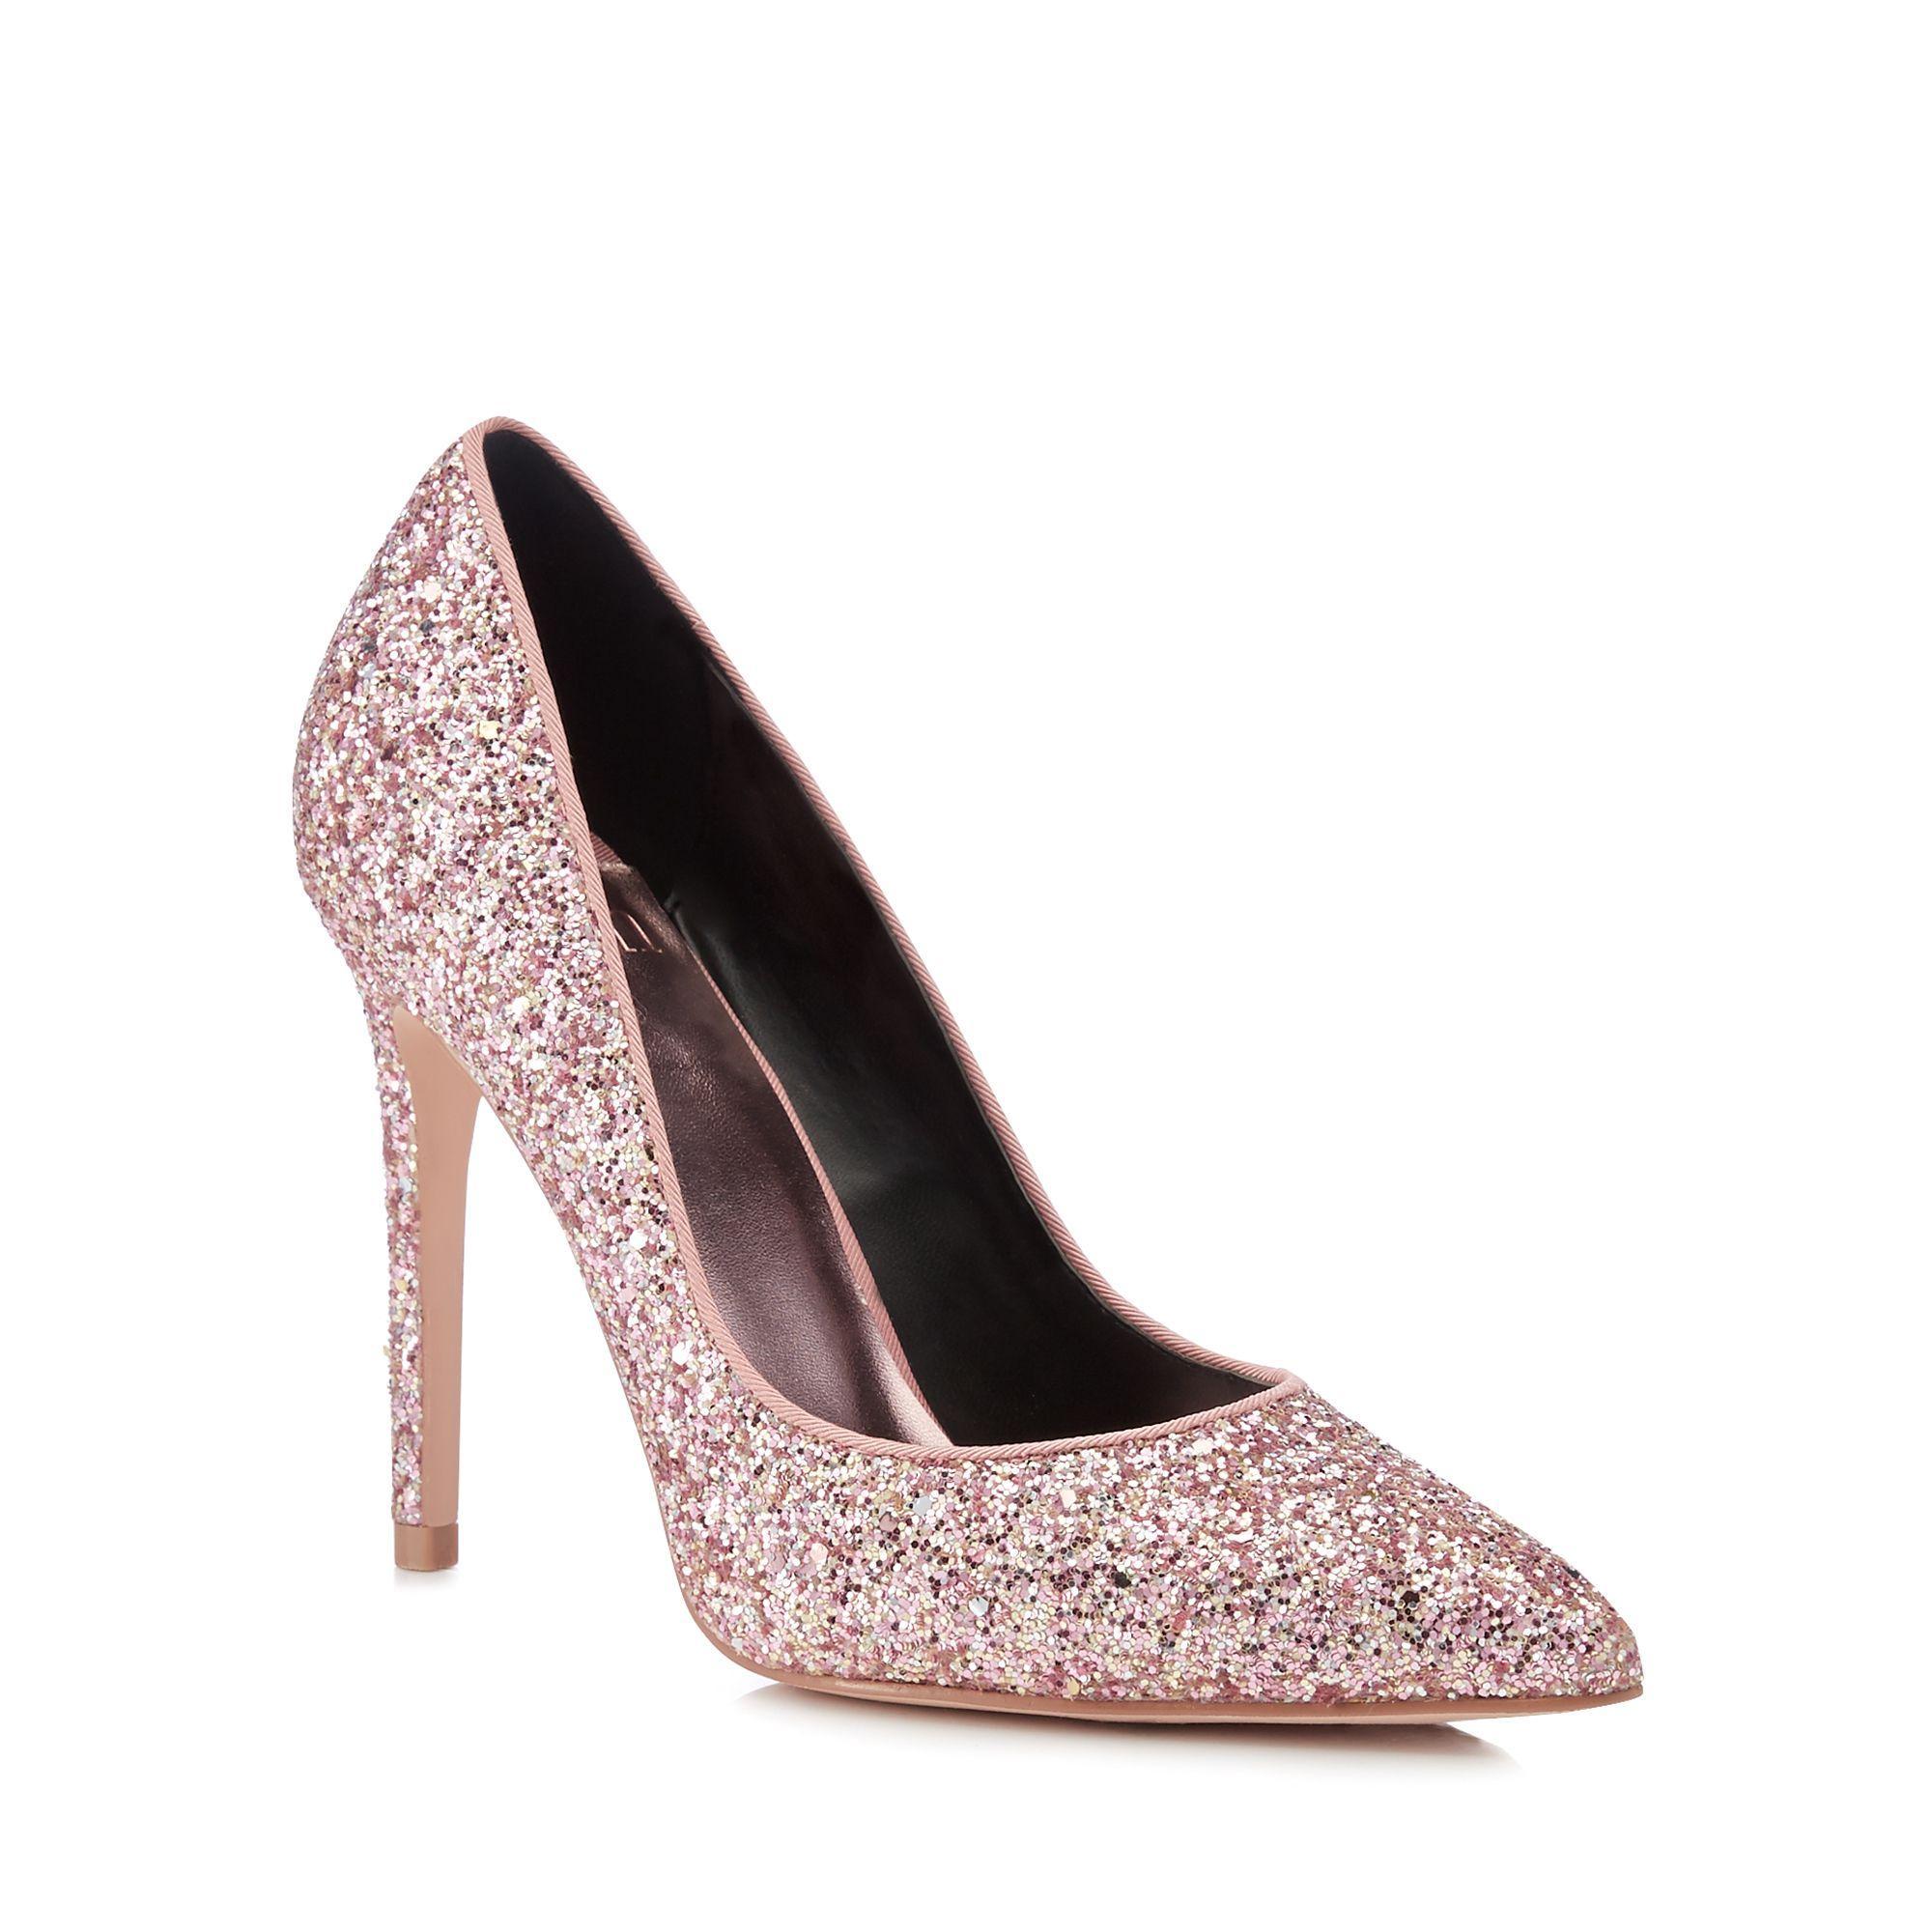 252ca3cef Faith - Pink Glitter  chloe  Stiletto Heel Pointed Toe Court Shoes - Lyst.  View fullscreen